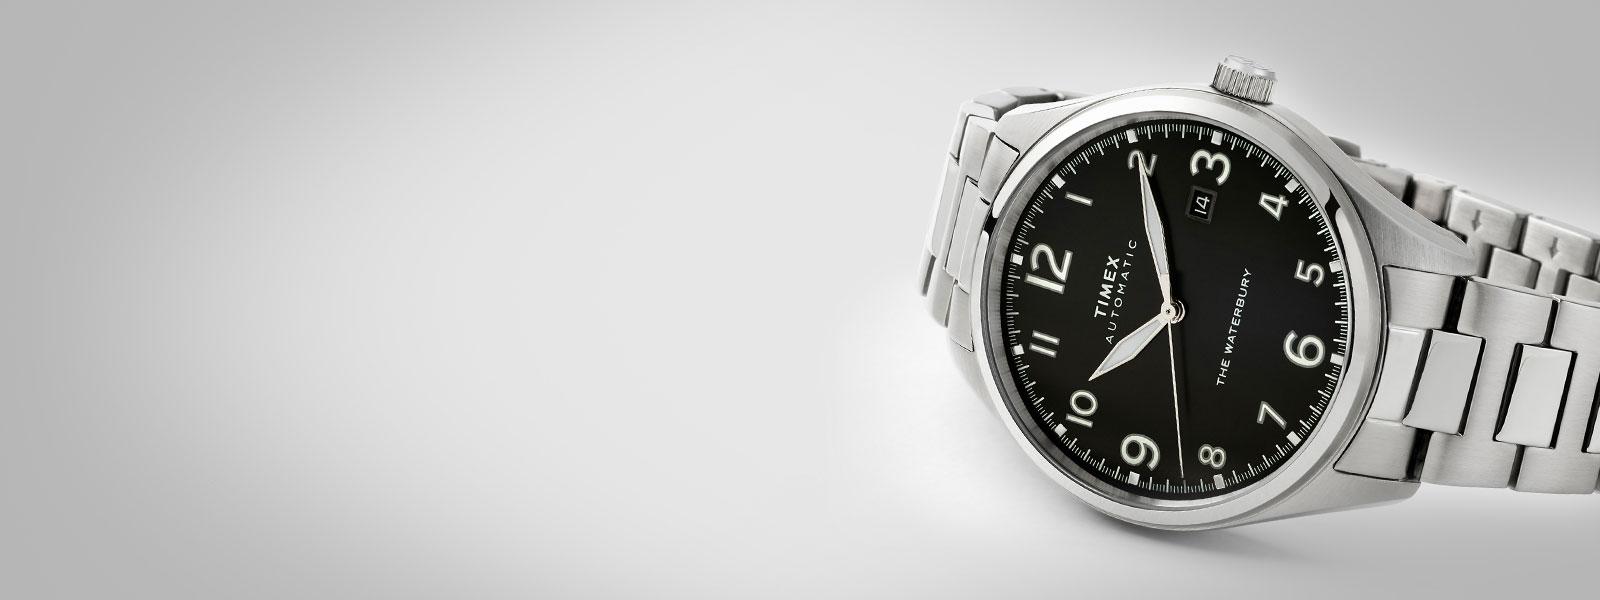 TIMEX -<br>POPUST 30%